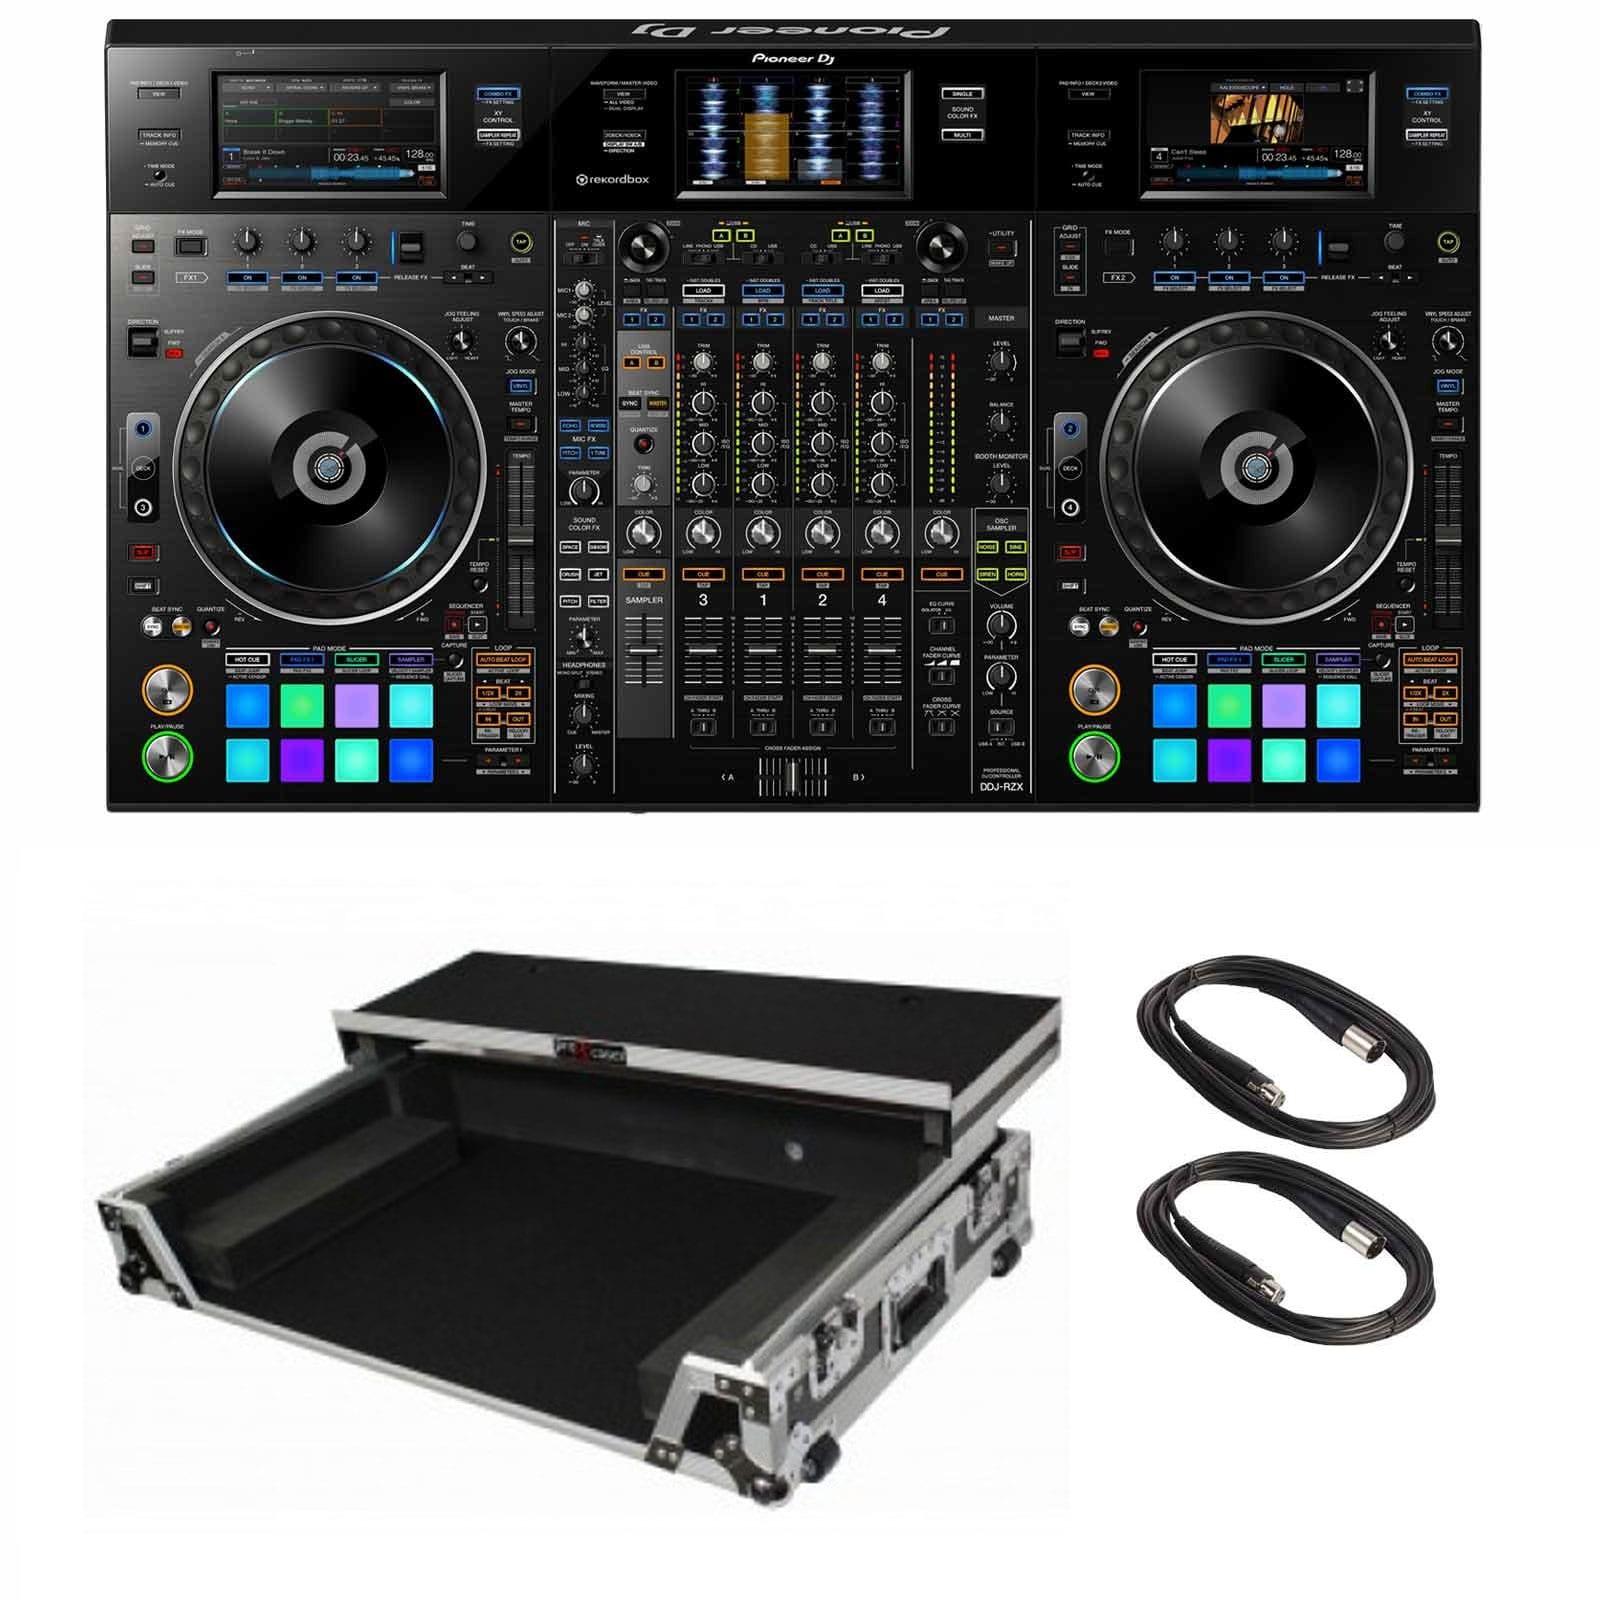 pioneer-ddj-rzx-professional-4-channel-controller-for-rekordbox-dj-rekordbox-video-ata-case-package-e8c.jpg